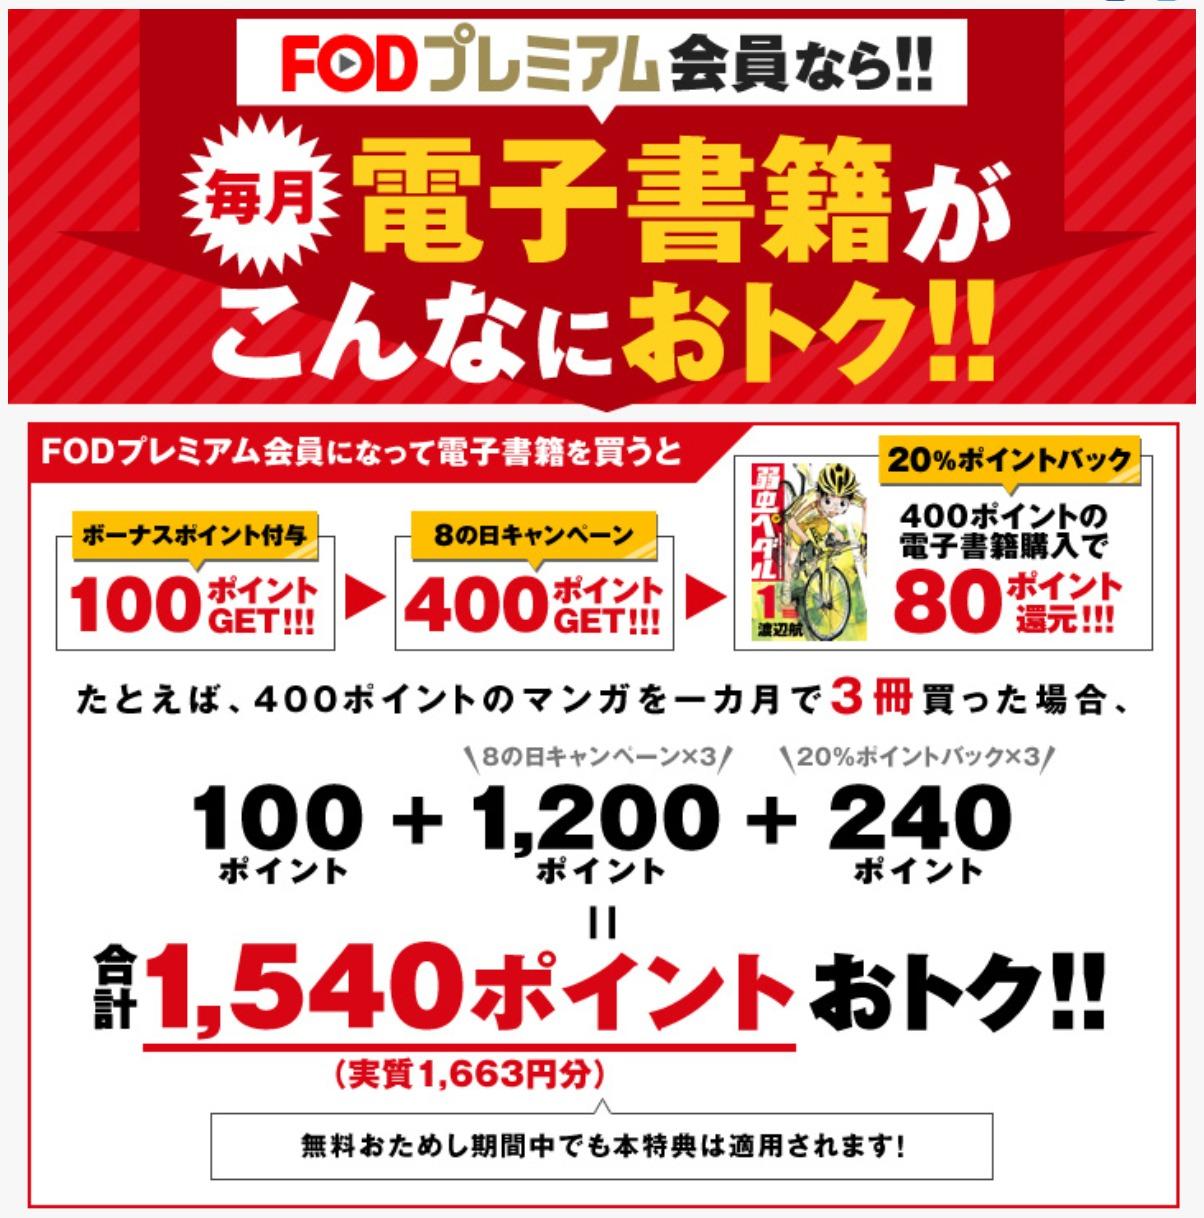 FOD電子書籍購入で20%のポイント還元の説明画像